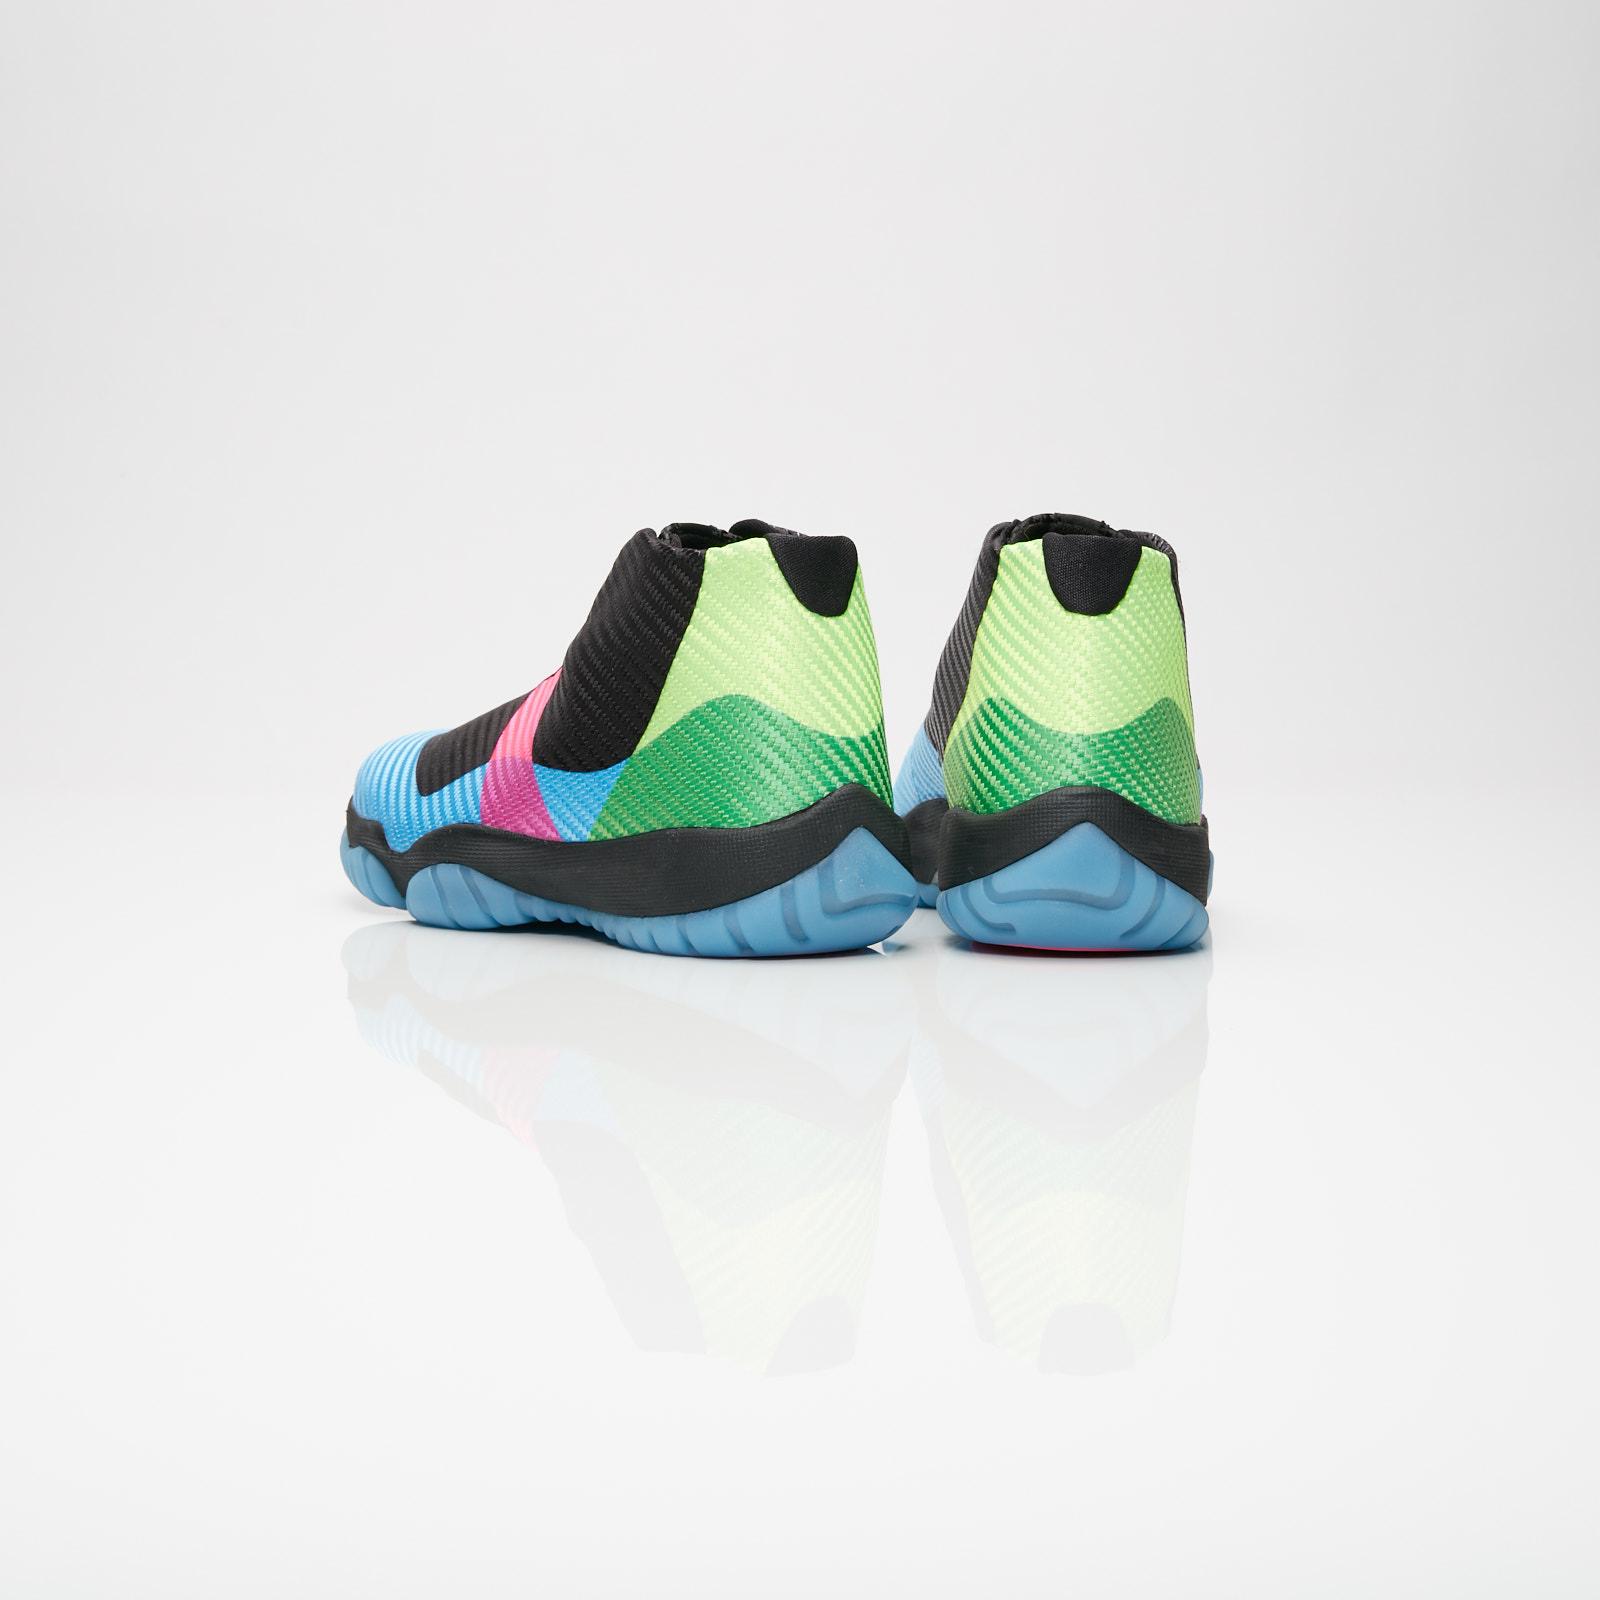 69c63202c9a8 Jordan Brand Air Jordan Future Q54 GS - At9192-001 - Sneakersnstuff ...